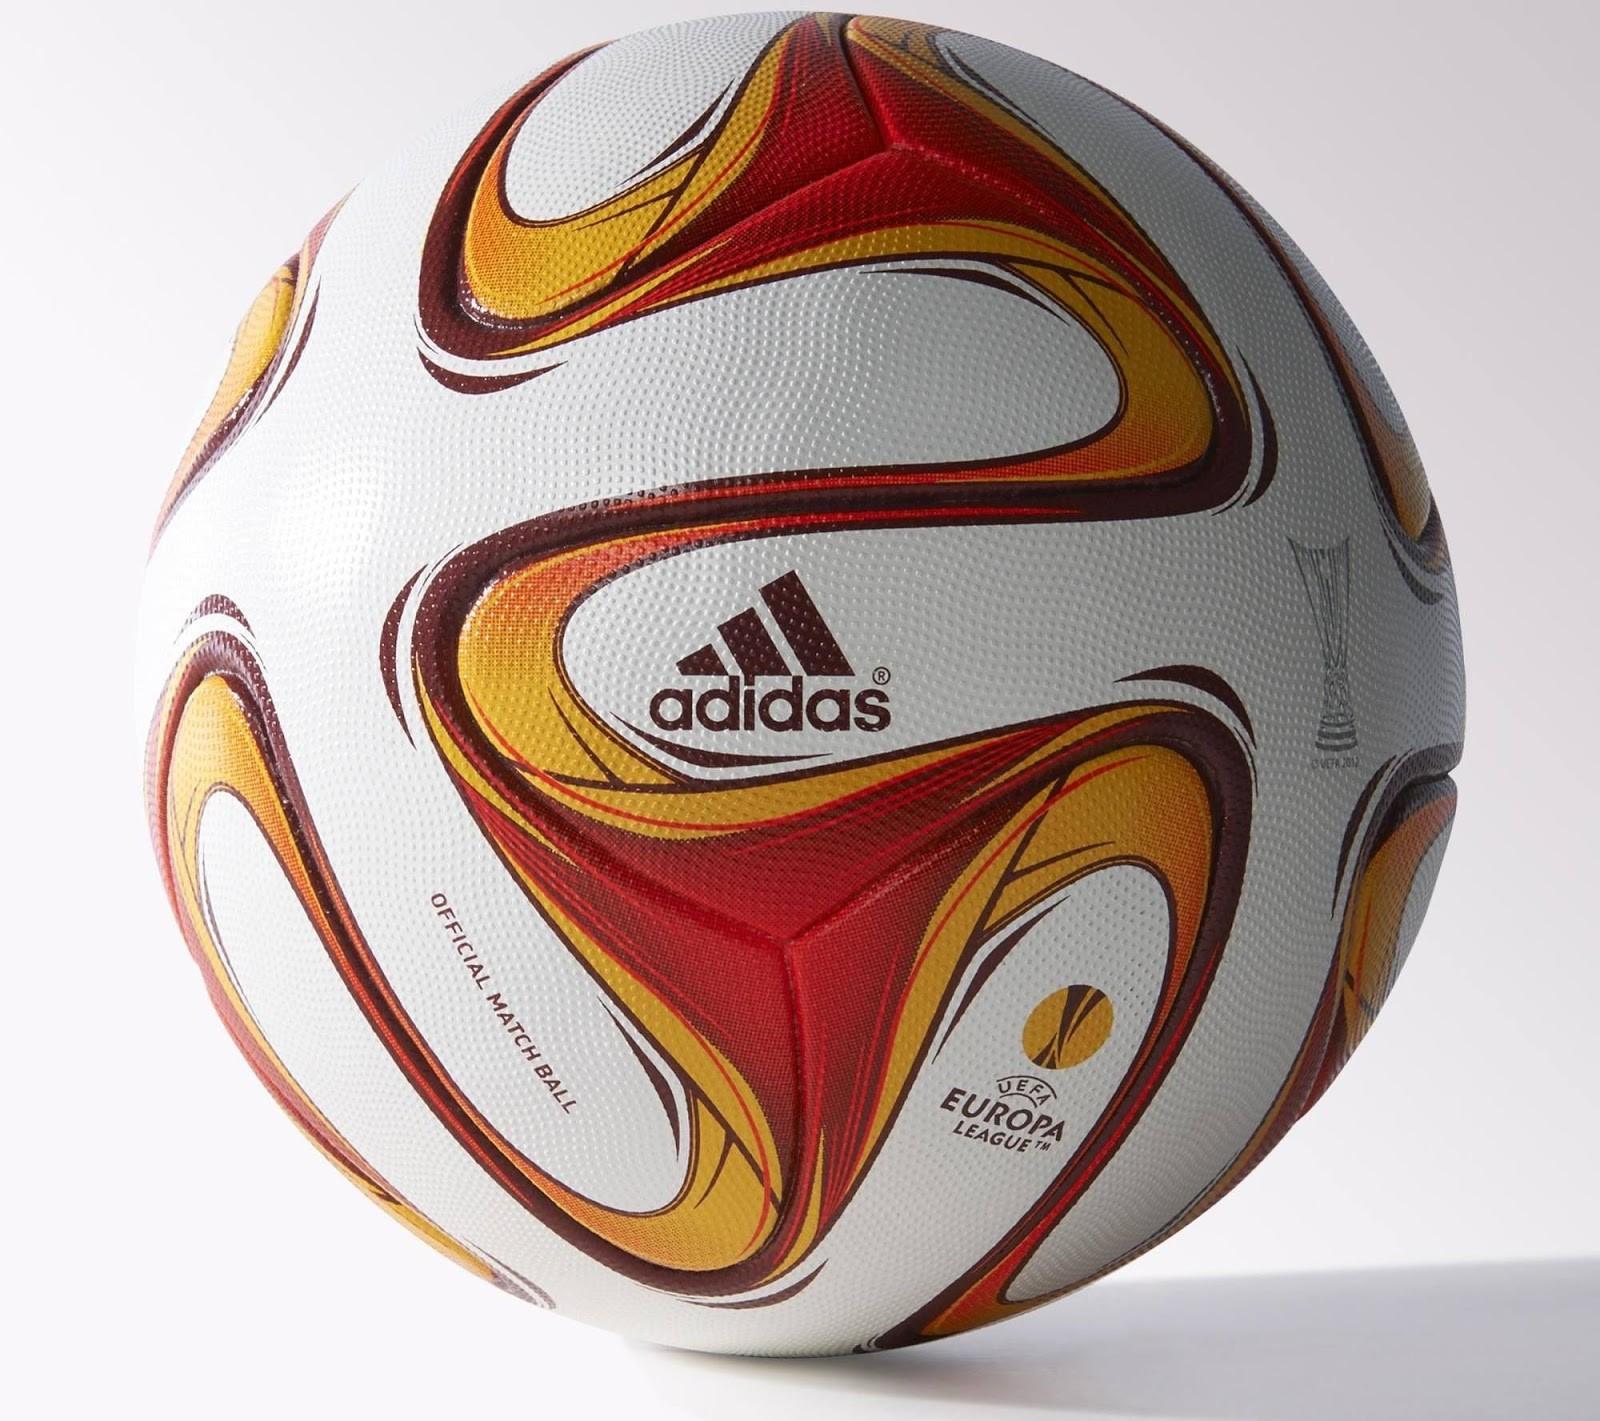 ADIDAS UEFA 2012 Futbola Bumba